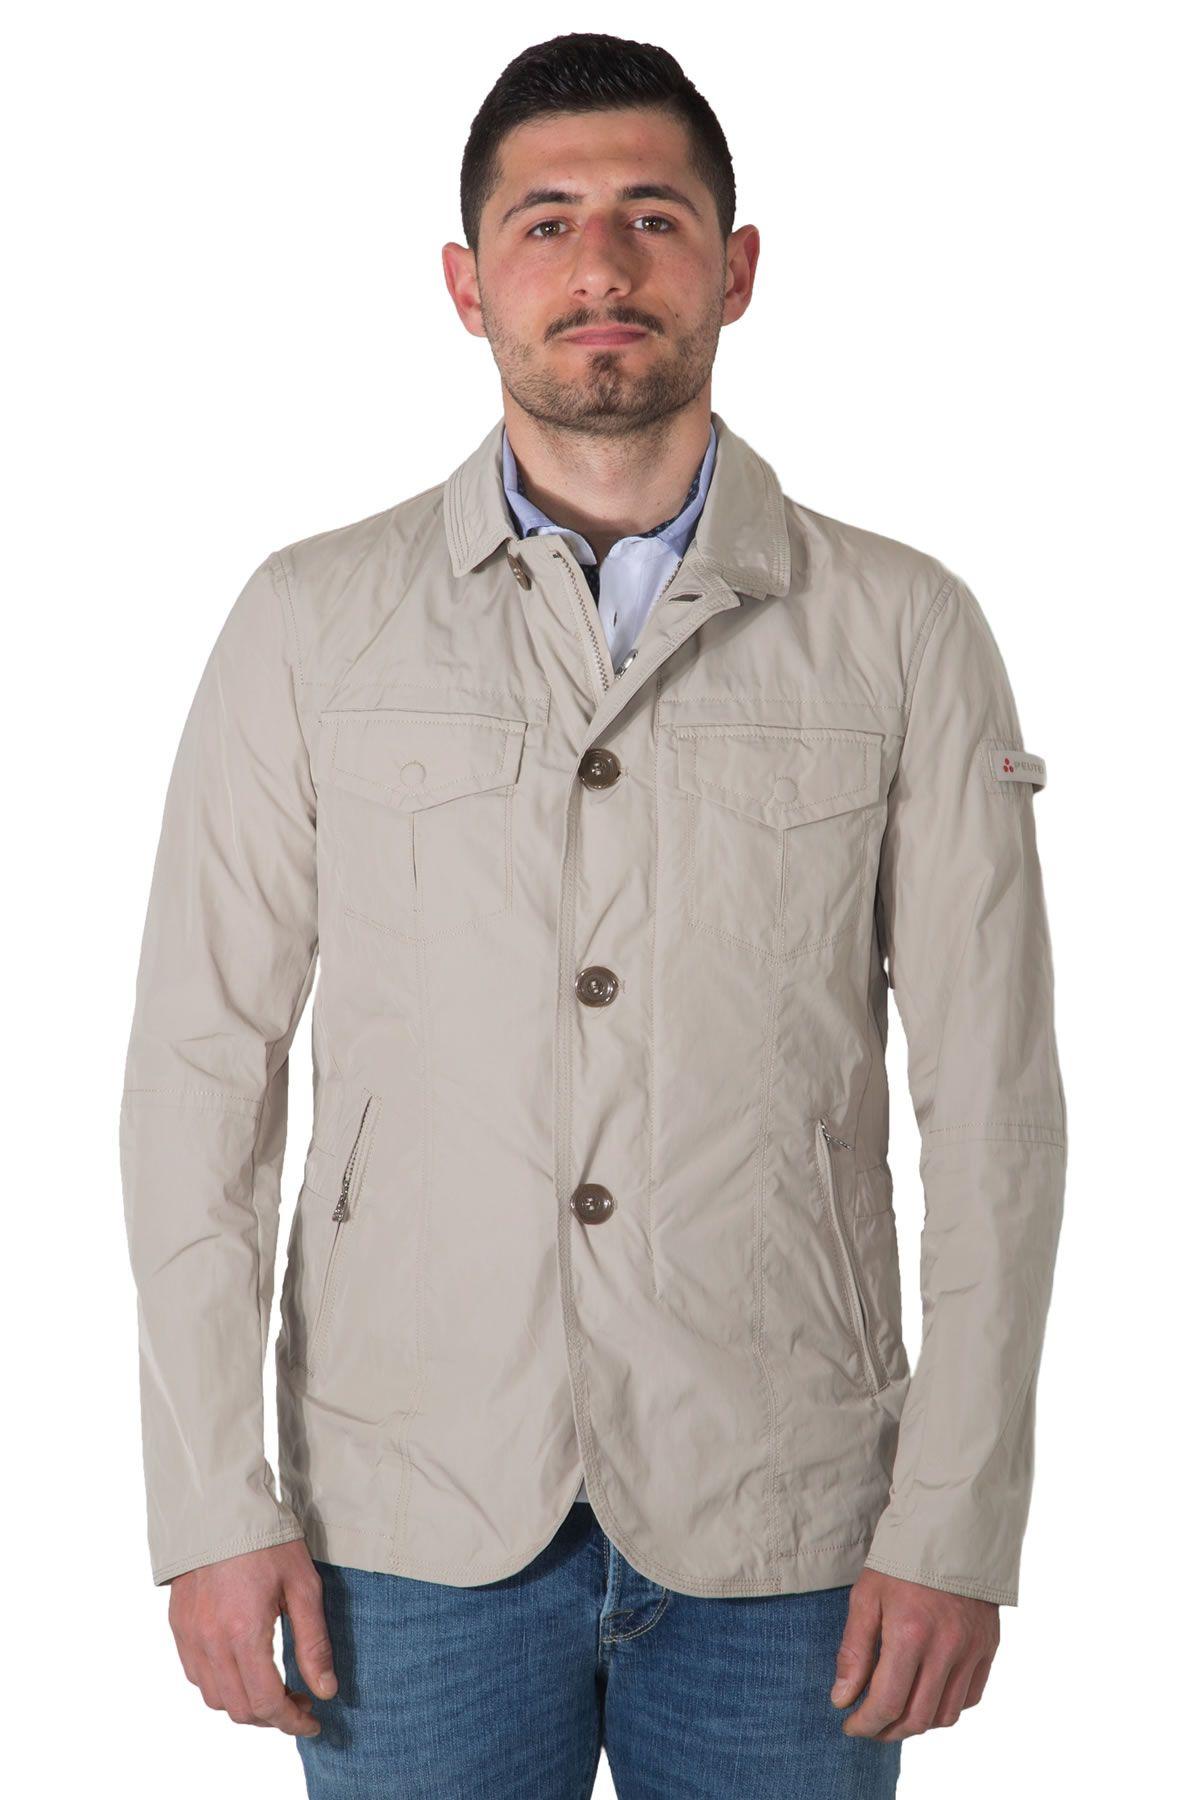 new product bbe88 d54e1 Plain nylon jacket Hollywood - Euro 258 | Peuterey ...